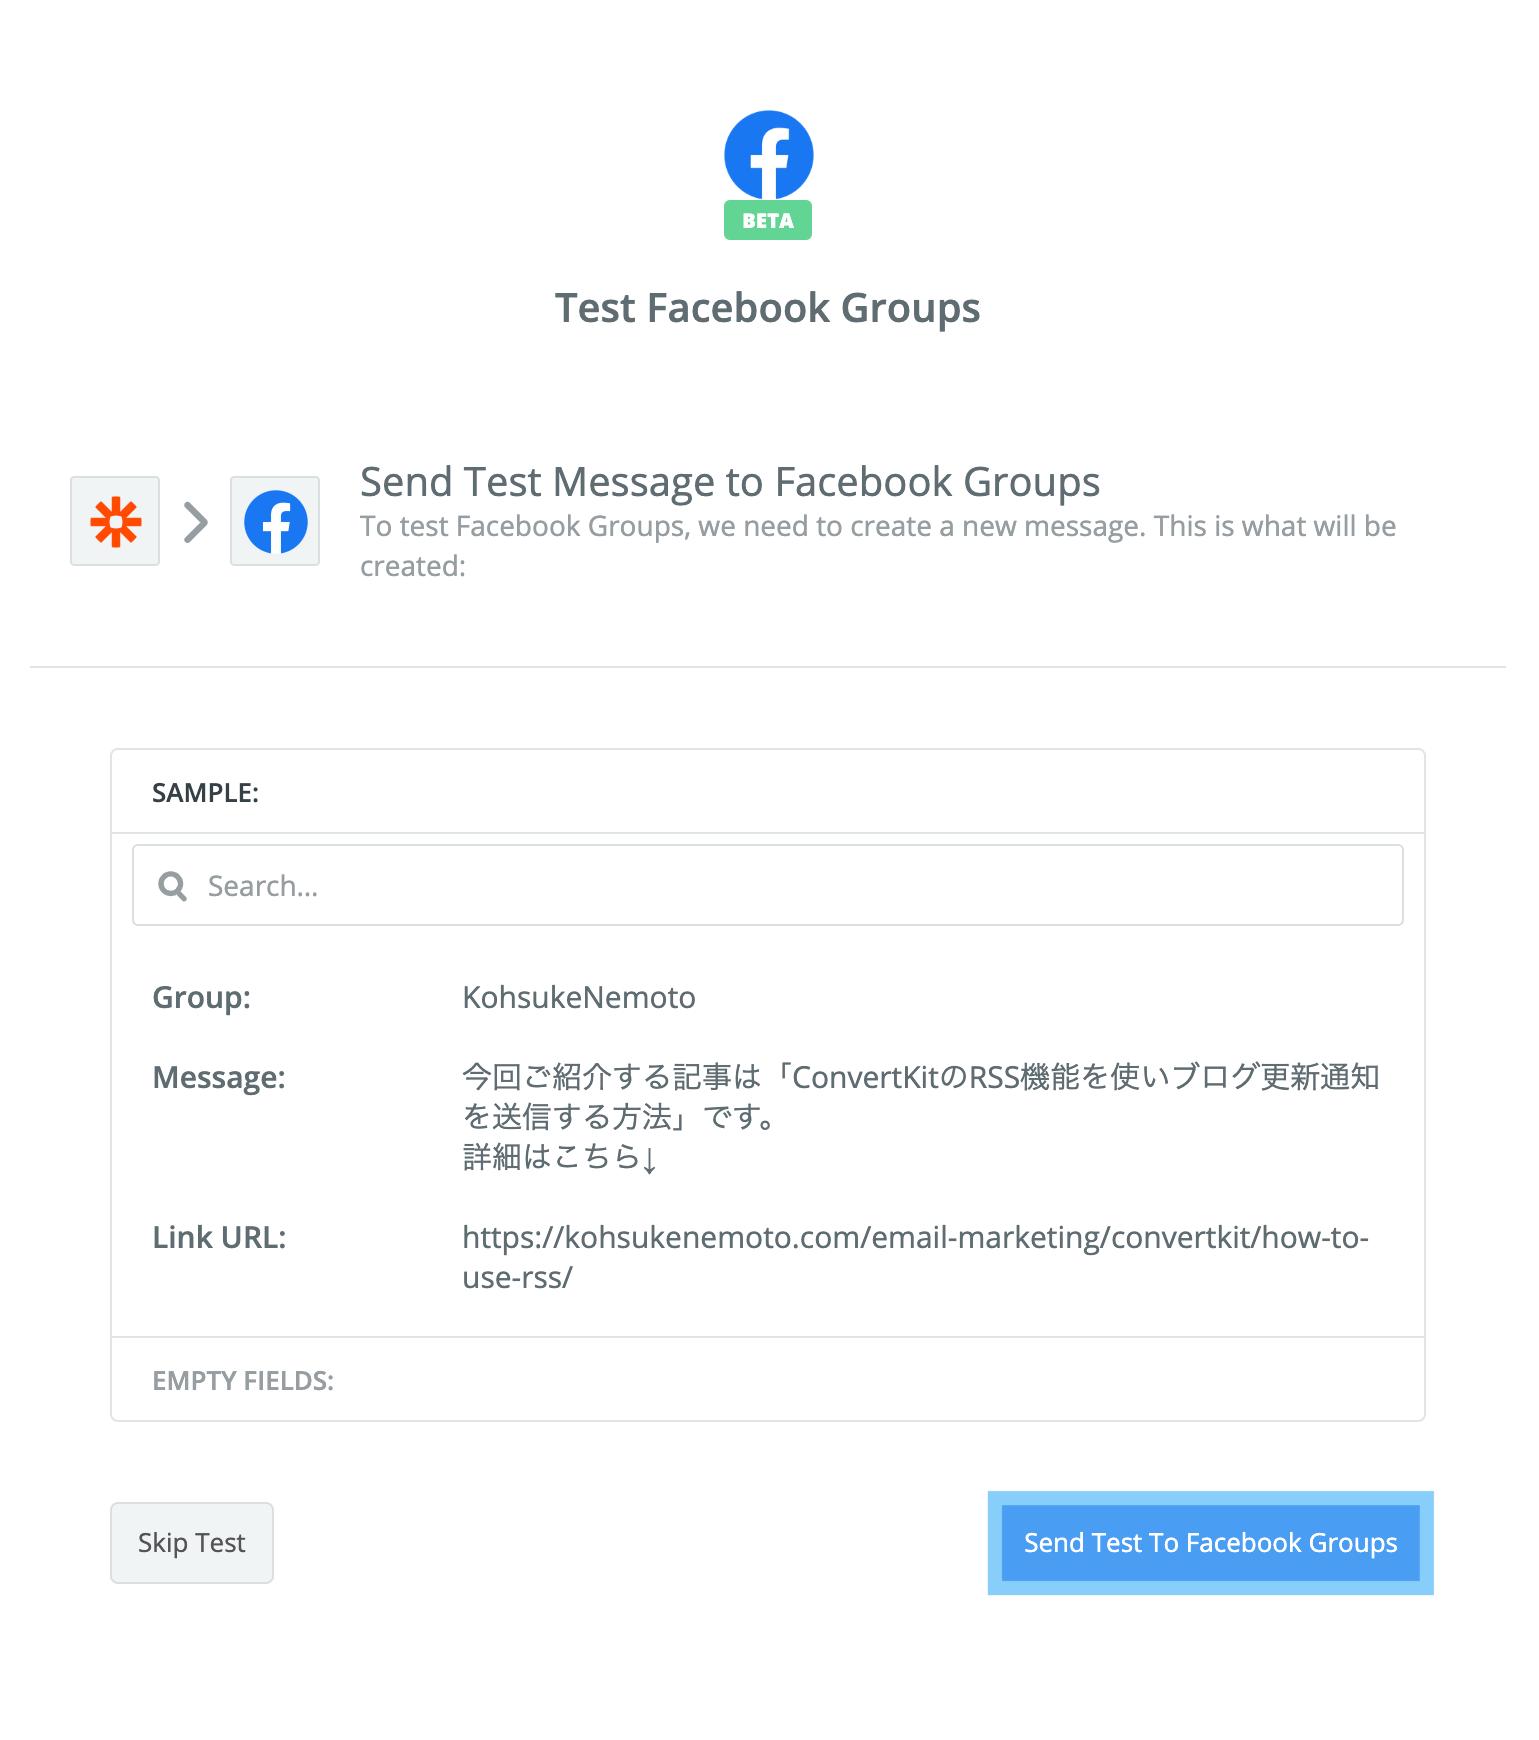 Facebookグループにテストを送信する